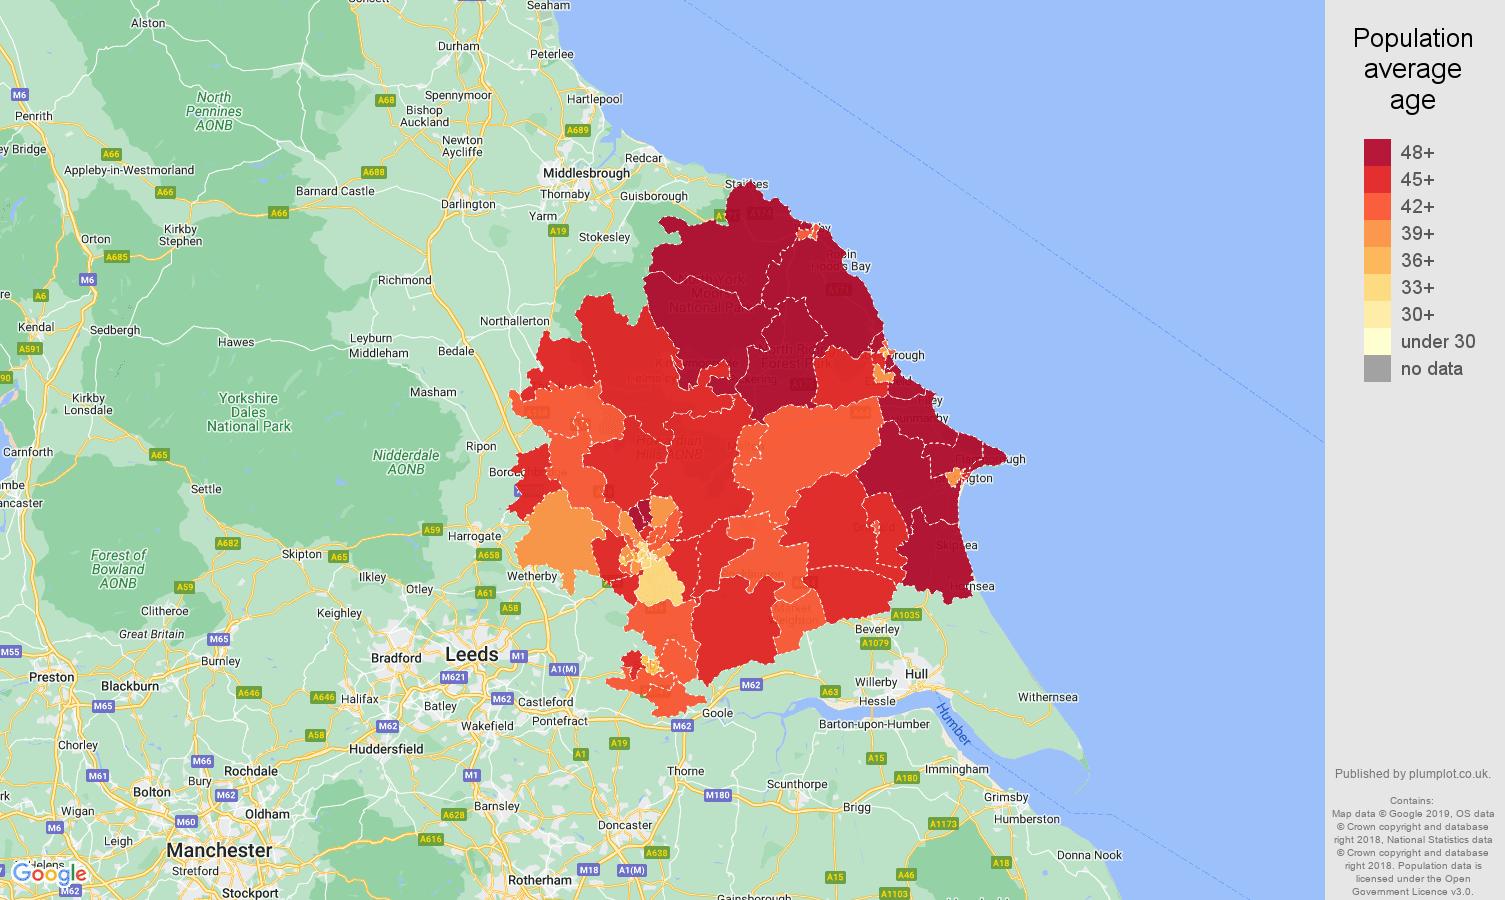 York population average age map